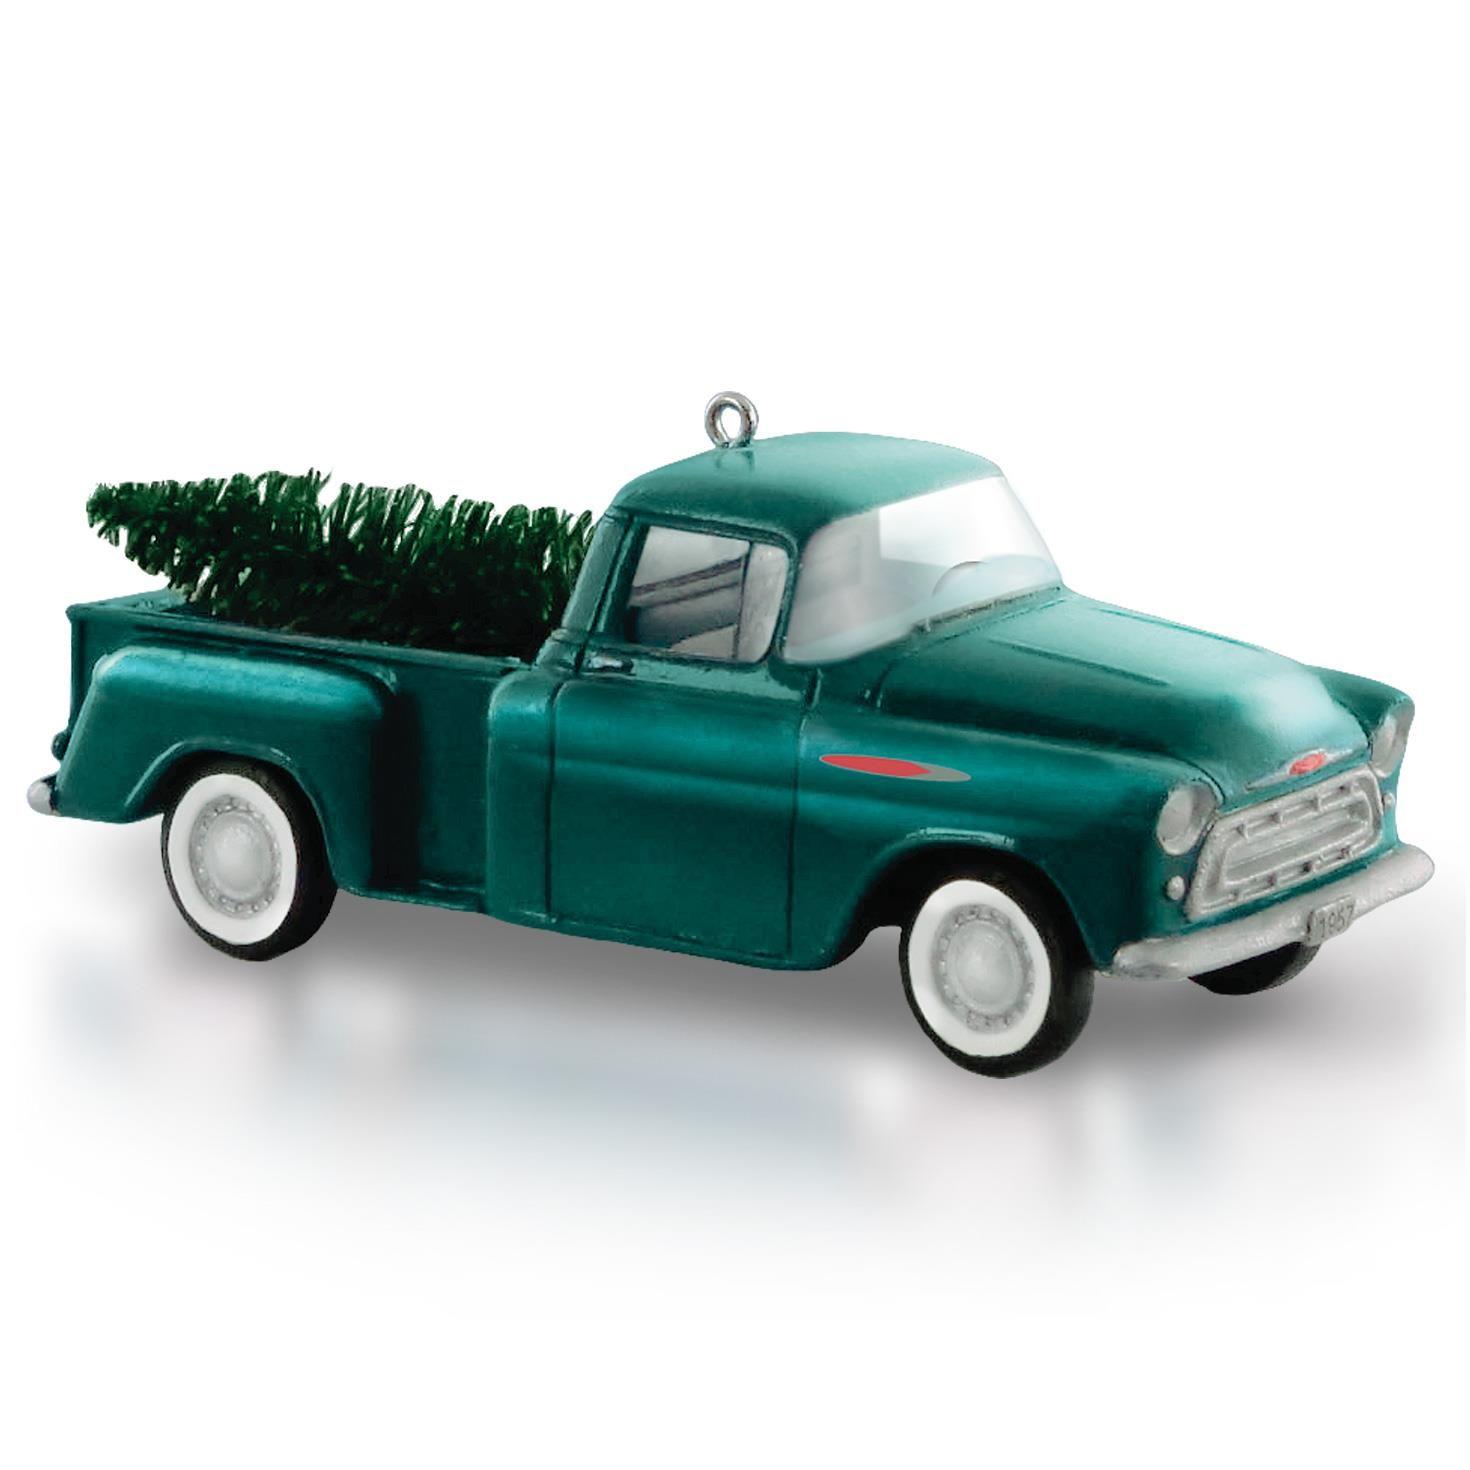 2015 Iron Man Hallmark Keepsake Ornament Hooked On Ornaments 1957 Chevrolet Sales Brochure